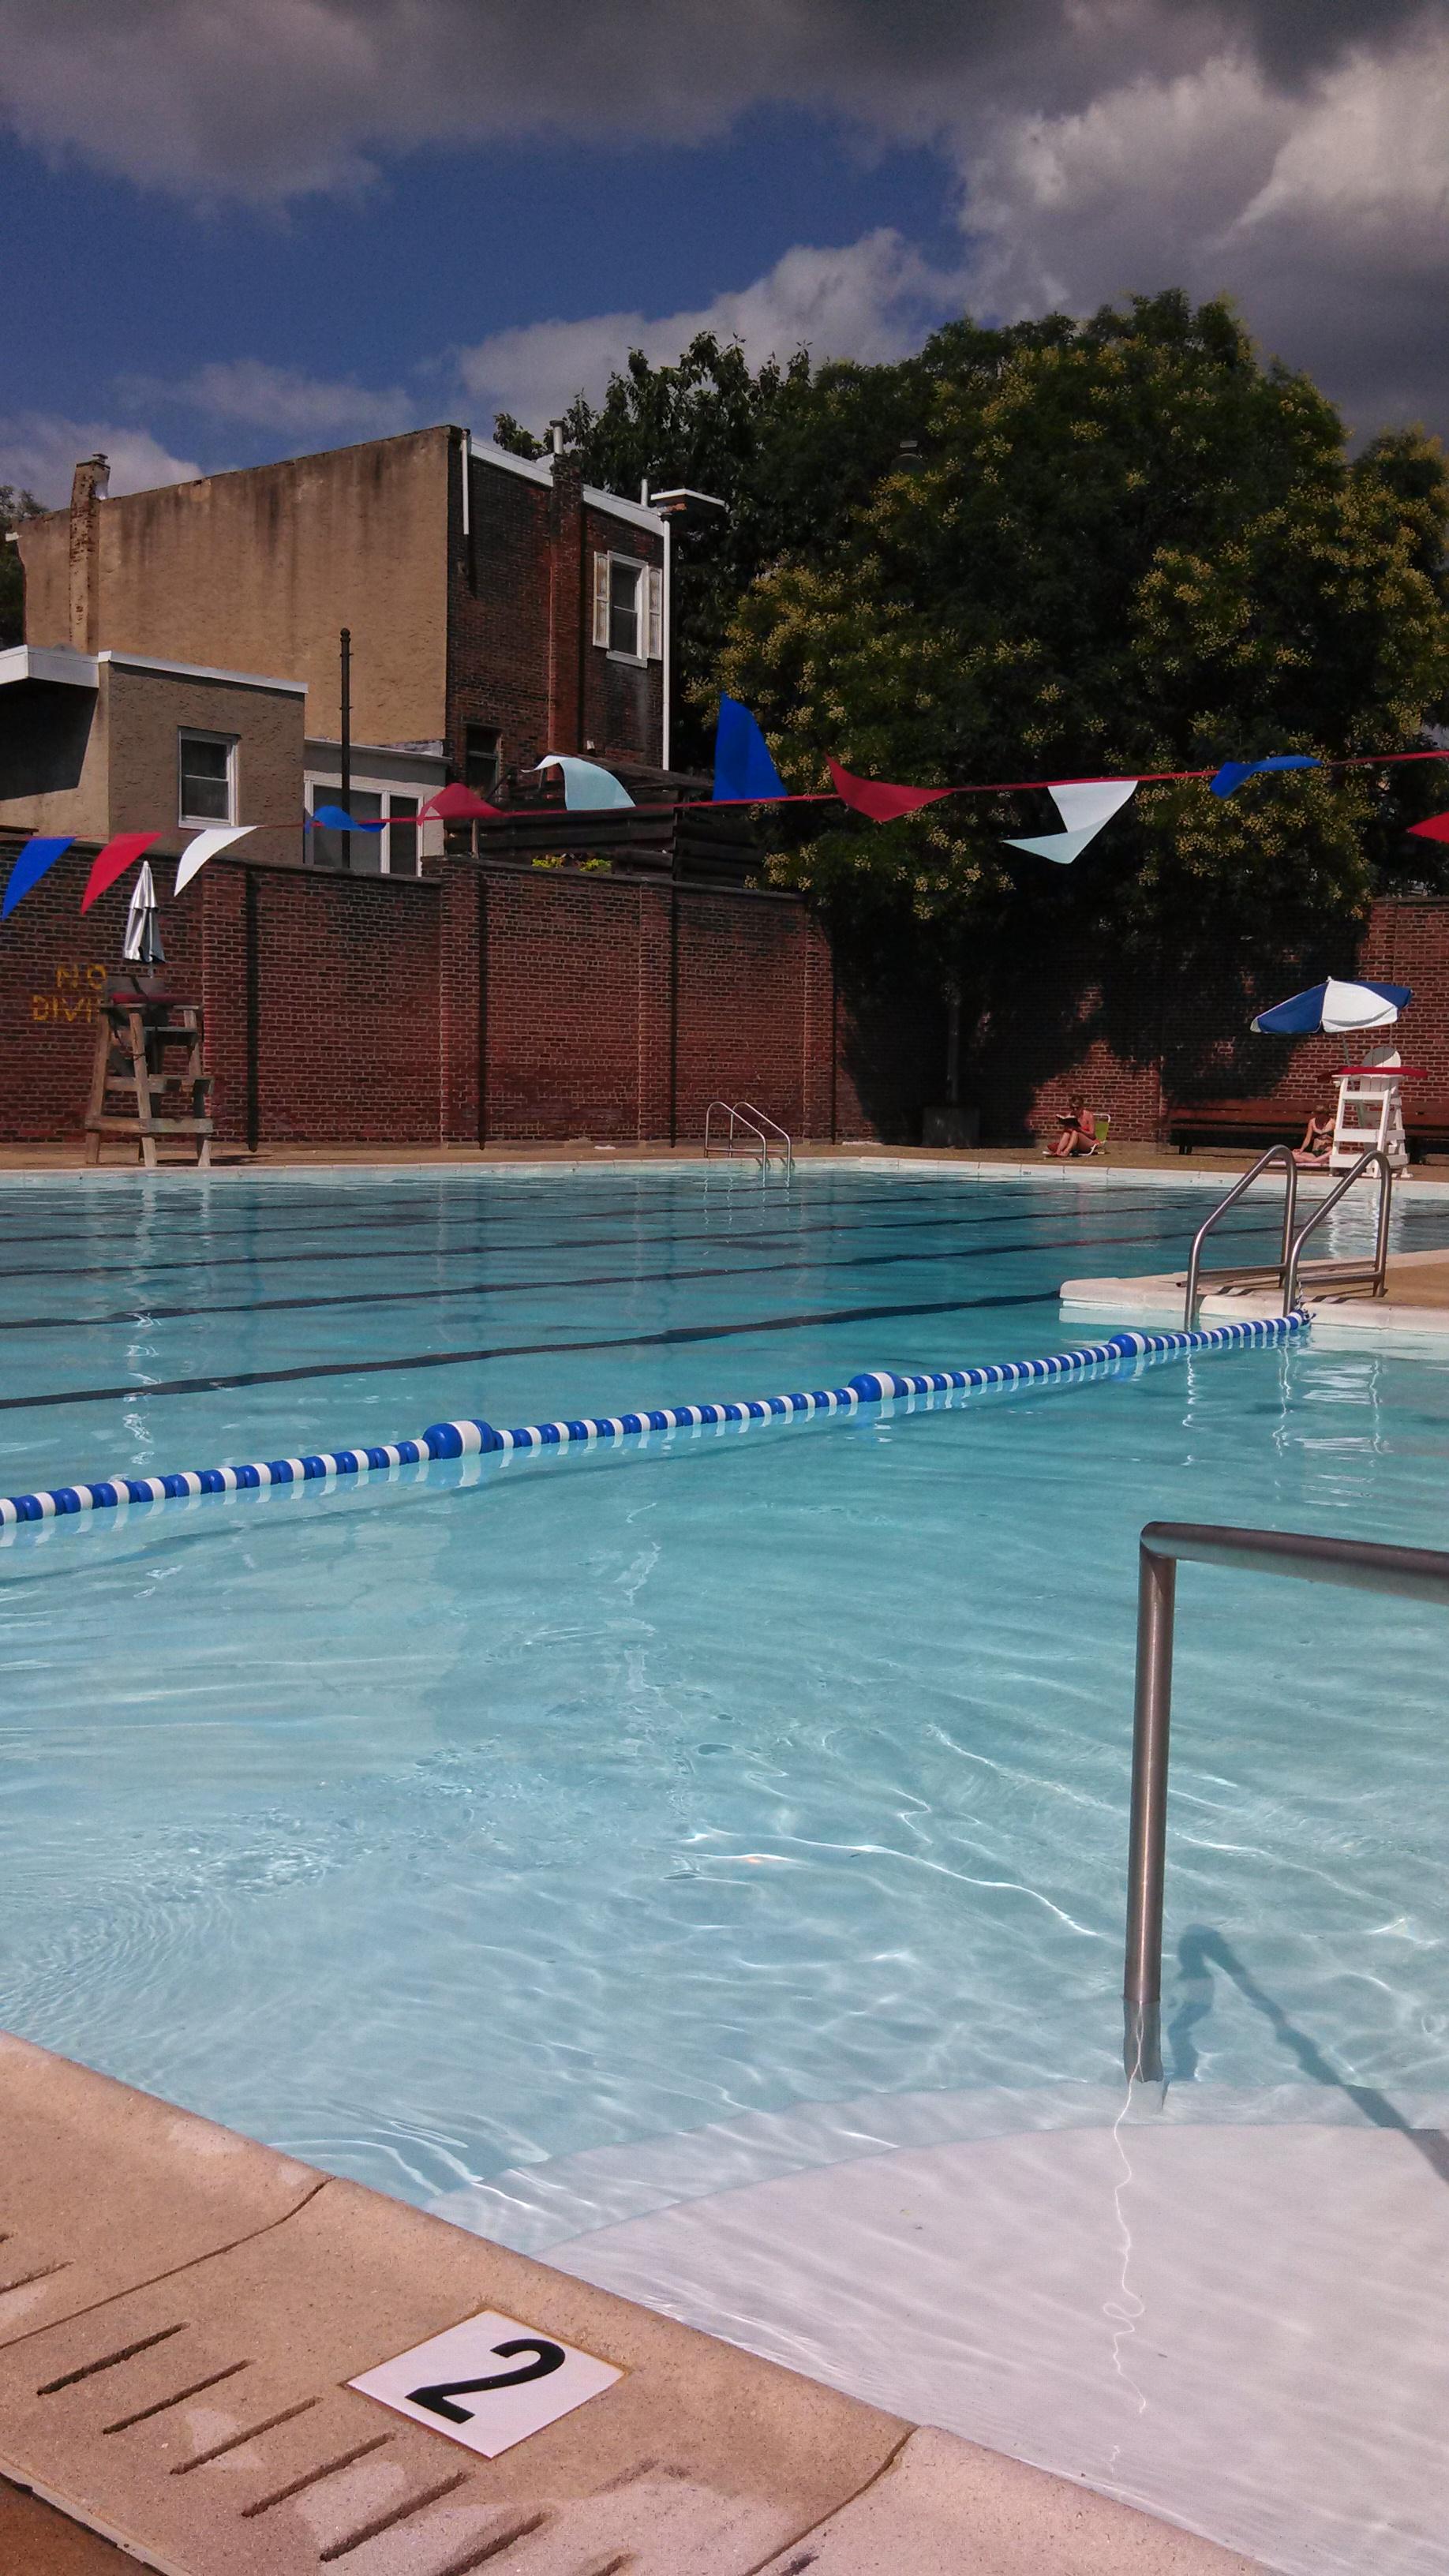 Pool city swimming philadelphia for Swimming pools in philadelphia